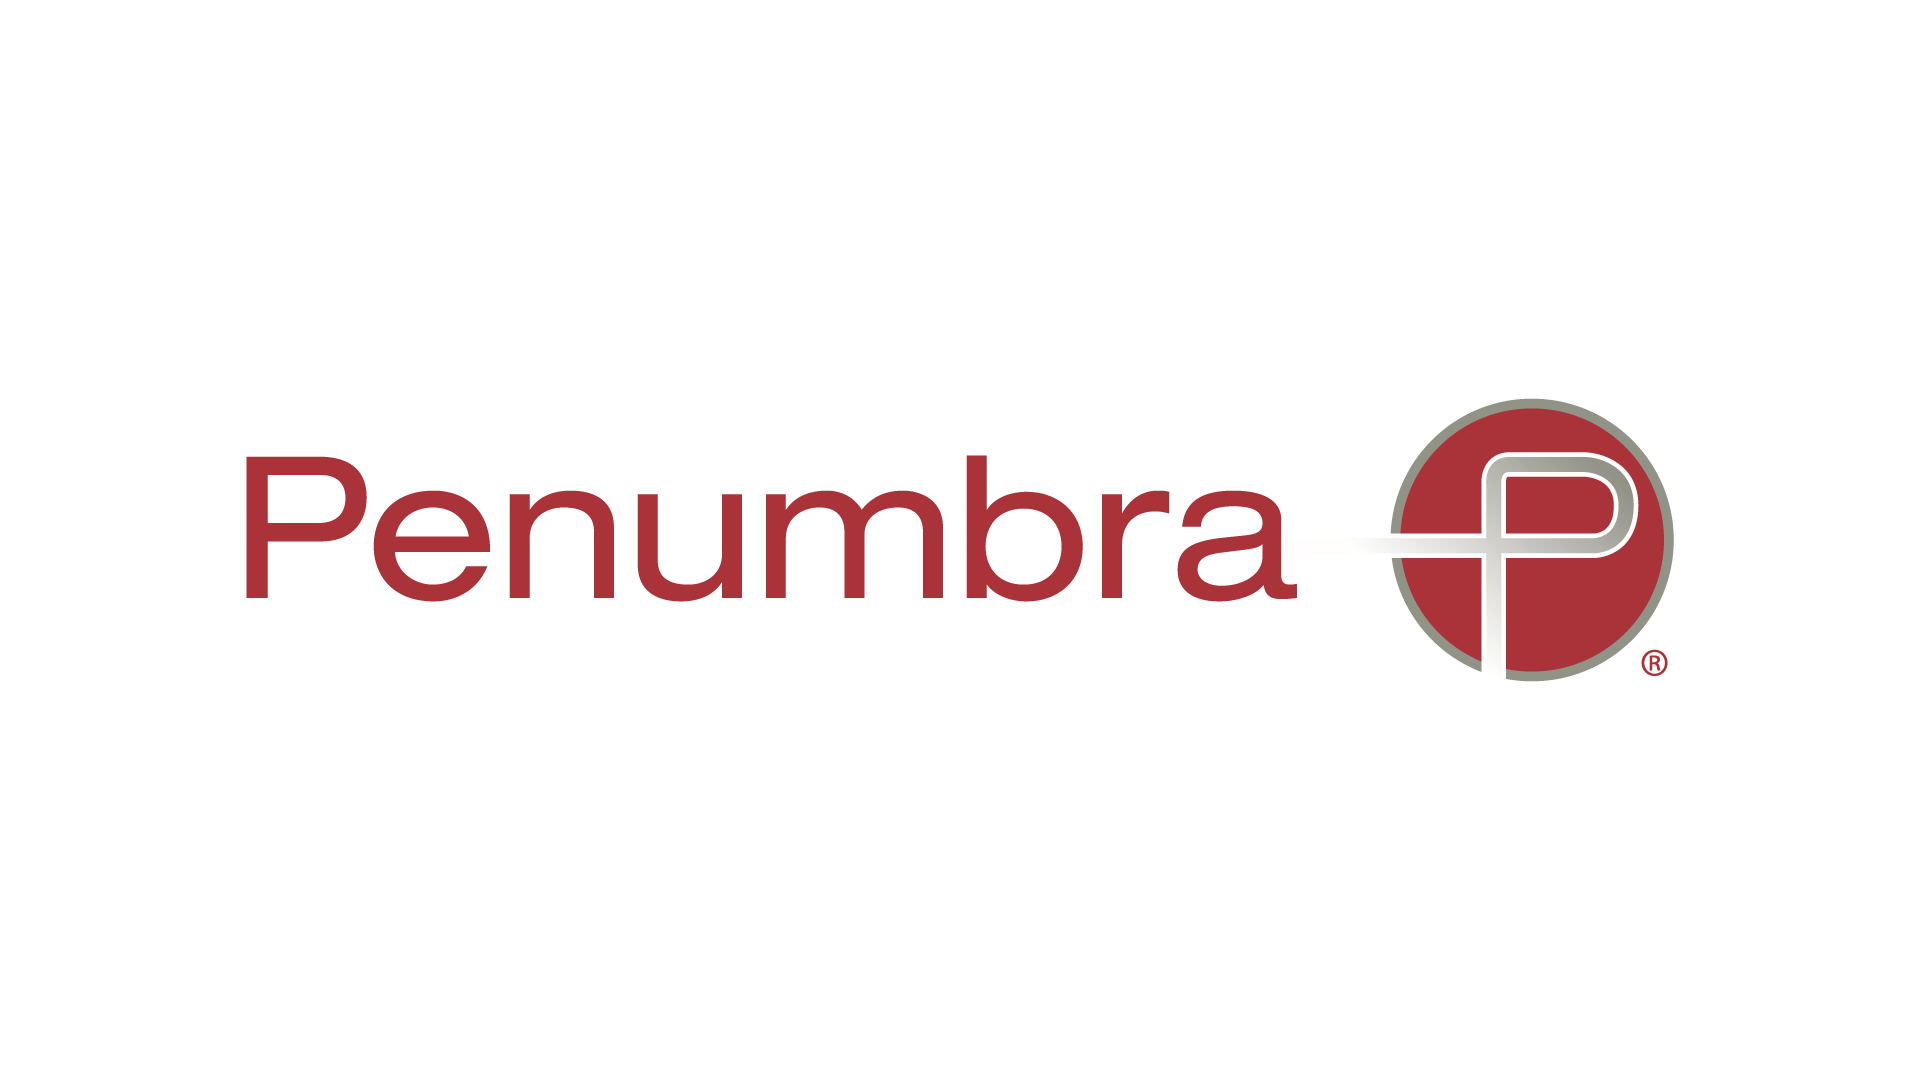 https://womensvascular.org/wp-content/uploads/sites/38/2019/12/penumbra-transparent.png